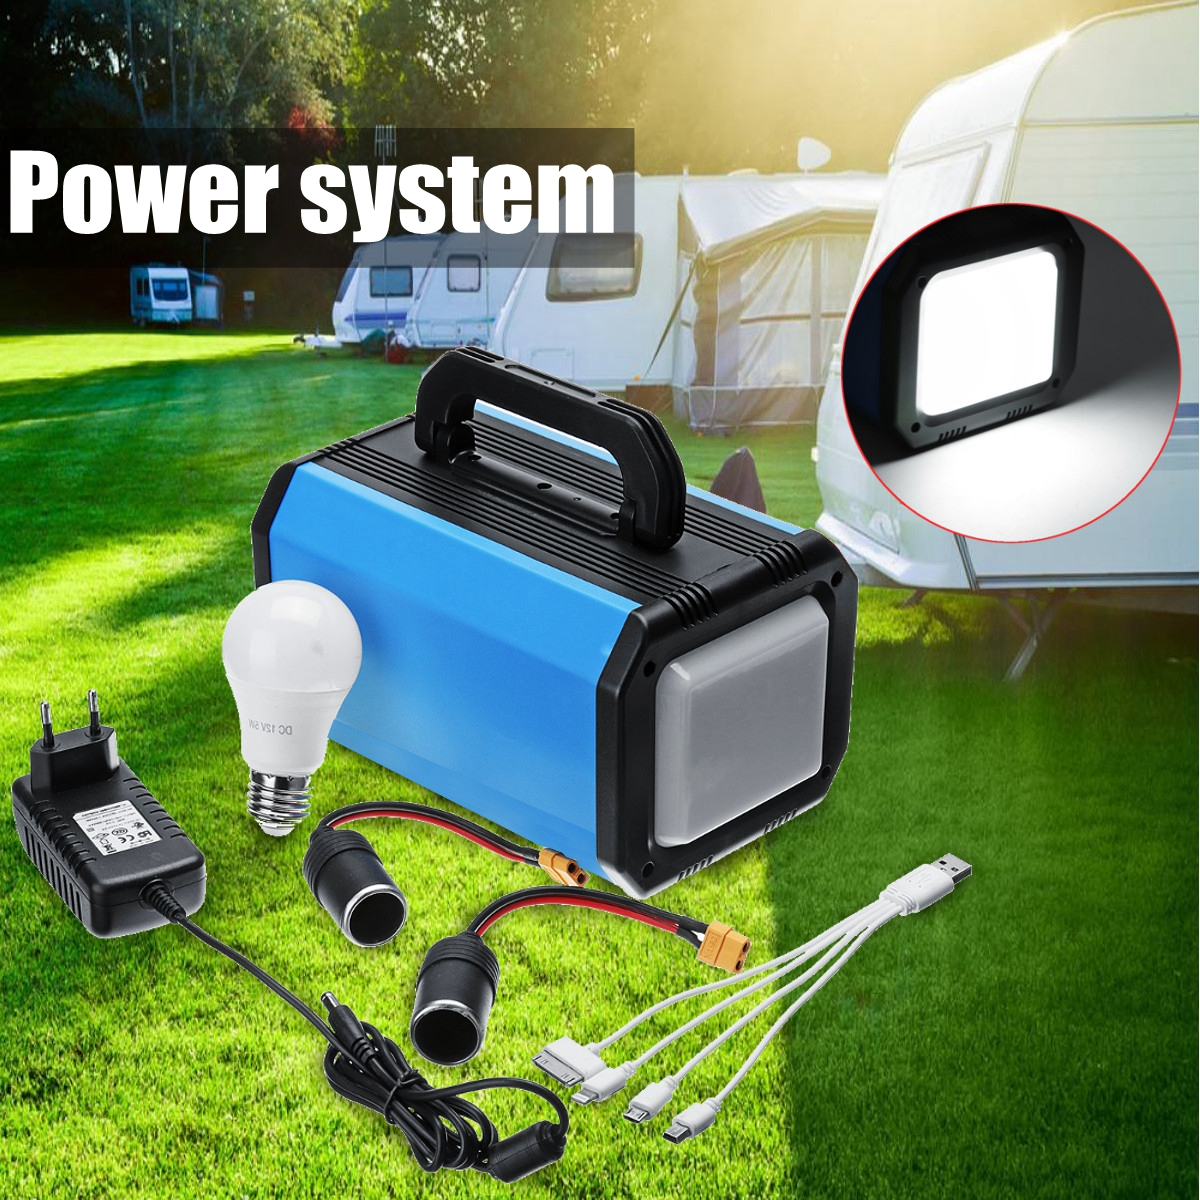 Easun Power Portable Solar Generator Mini 30w Panel 12v Pwm Charge Controllersolar 220v Portablesolar 144w System Inverter Supply Energy Storage Source Outdoor